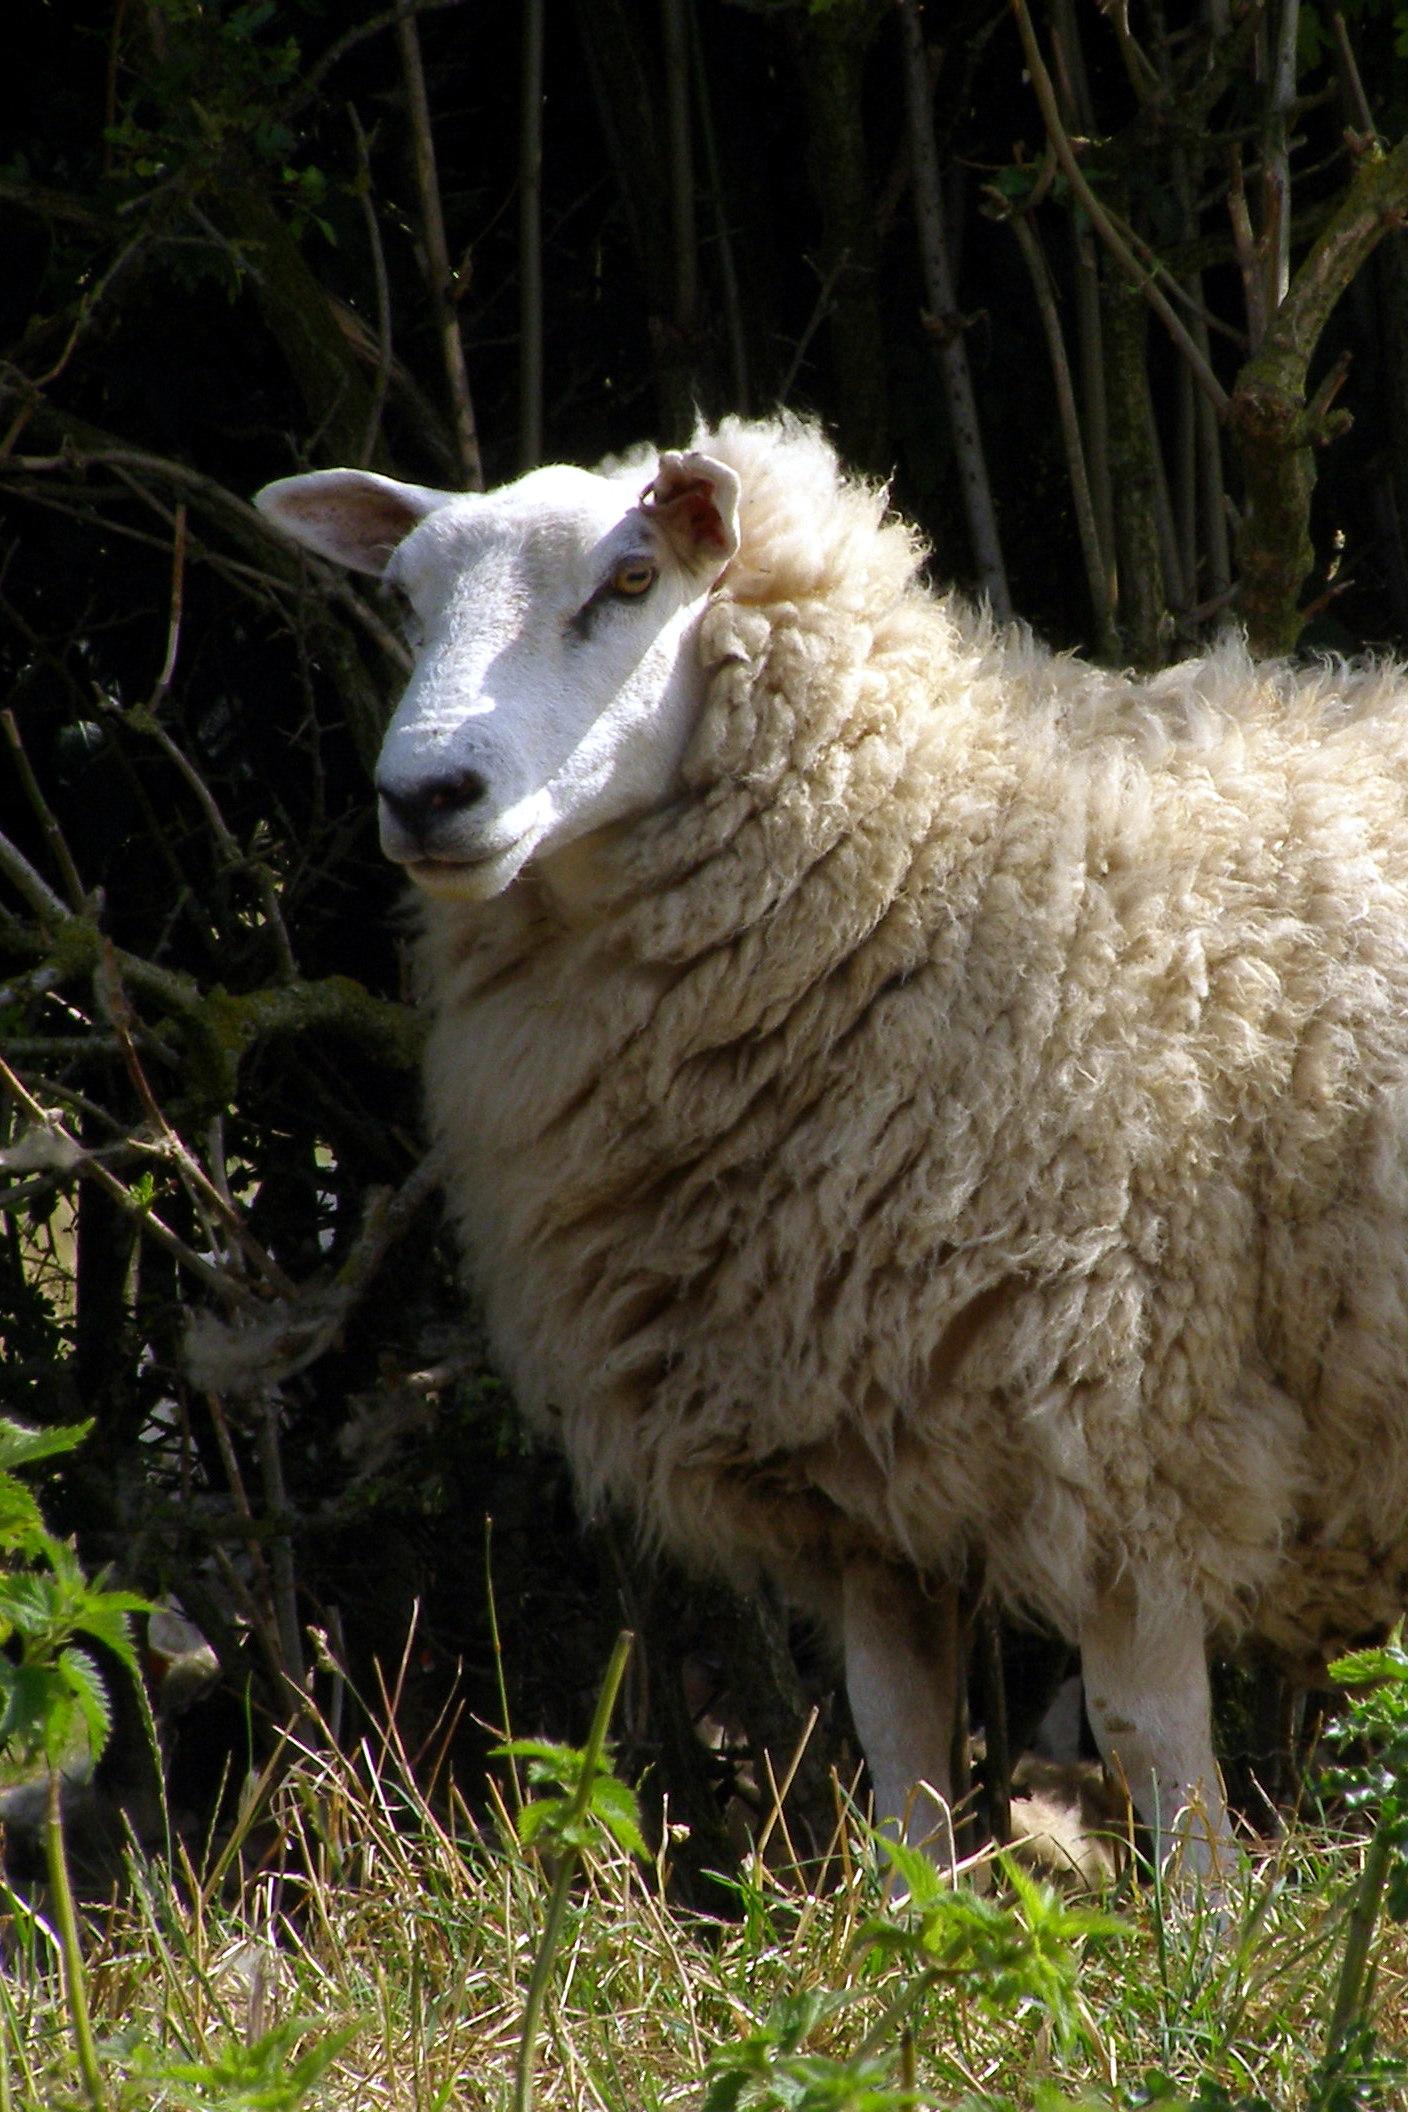 Badbury Rings Sheep   Badbury Rings